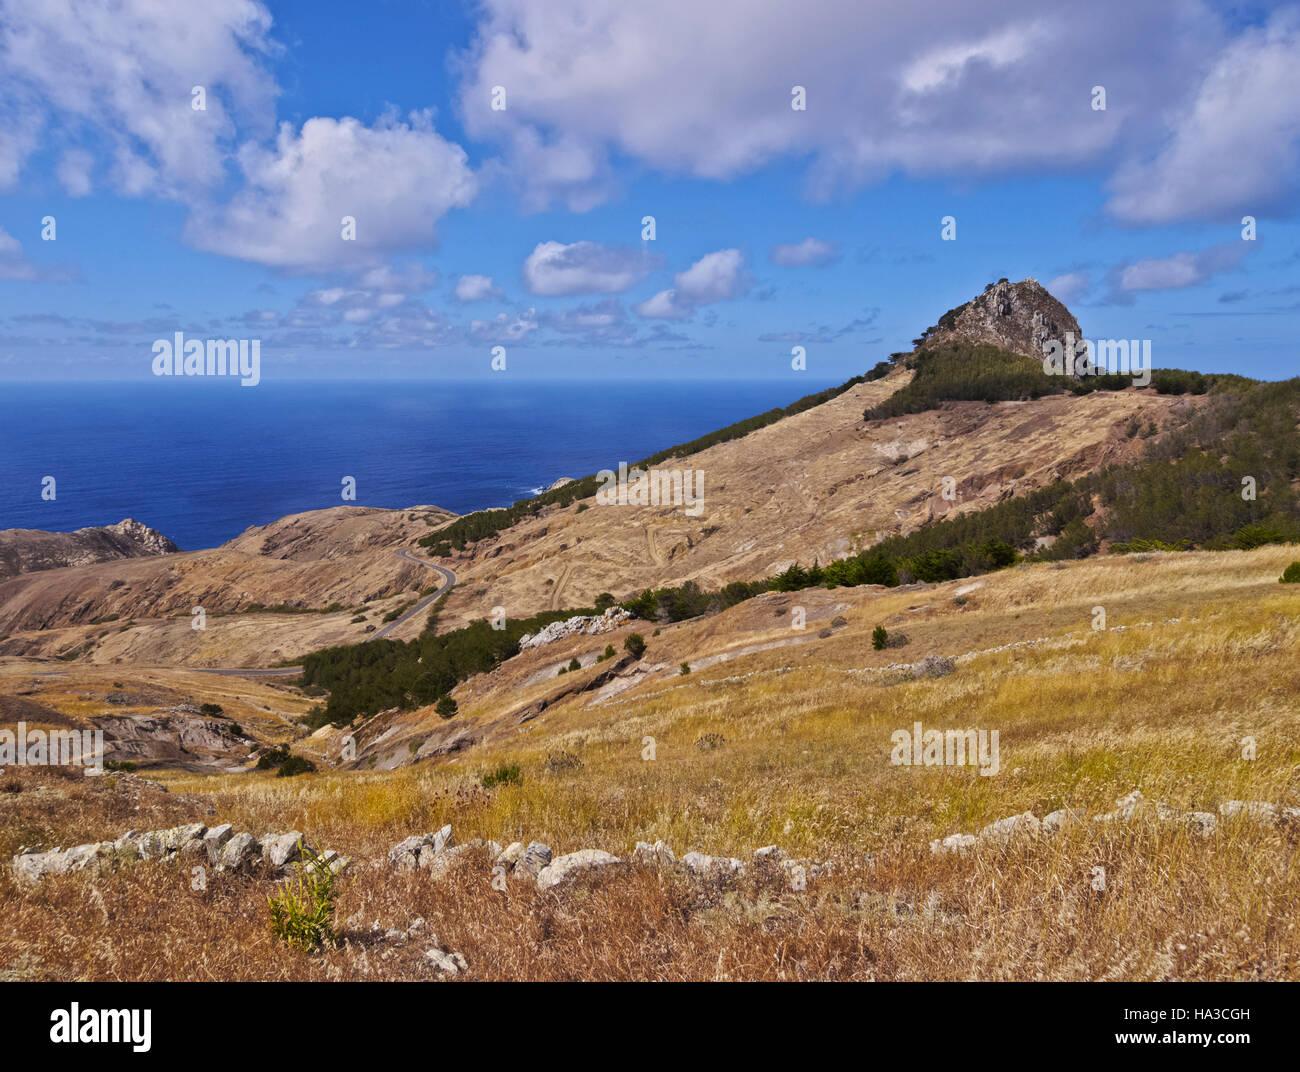 Portugal, Madeira Islands, Landscape of the Porto Santo Island. - Stock Image